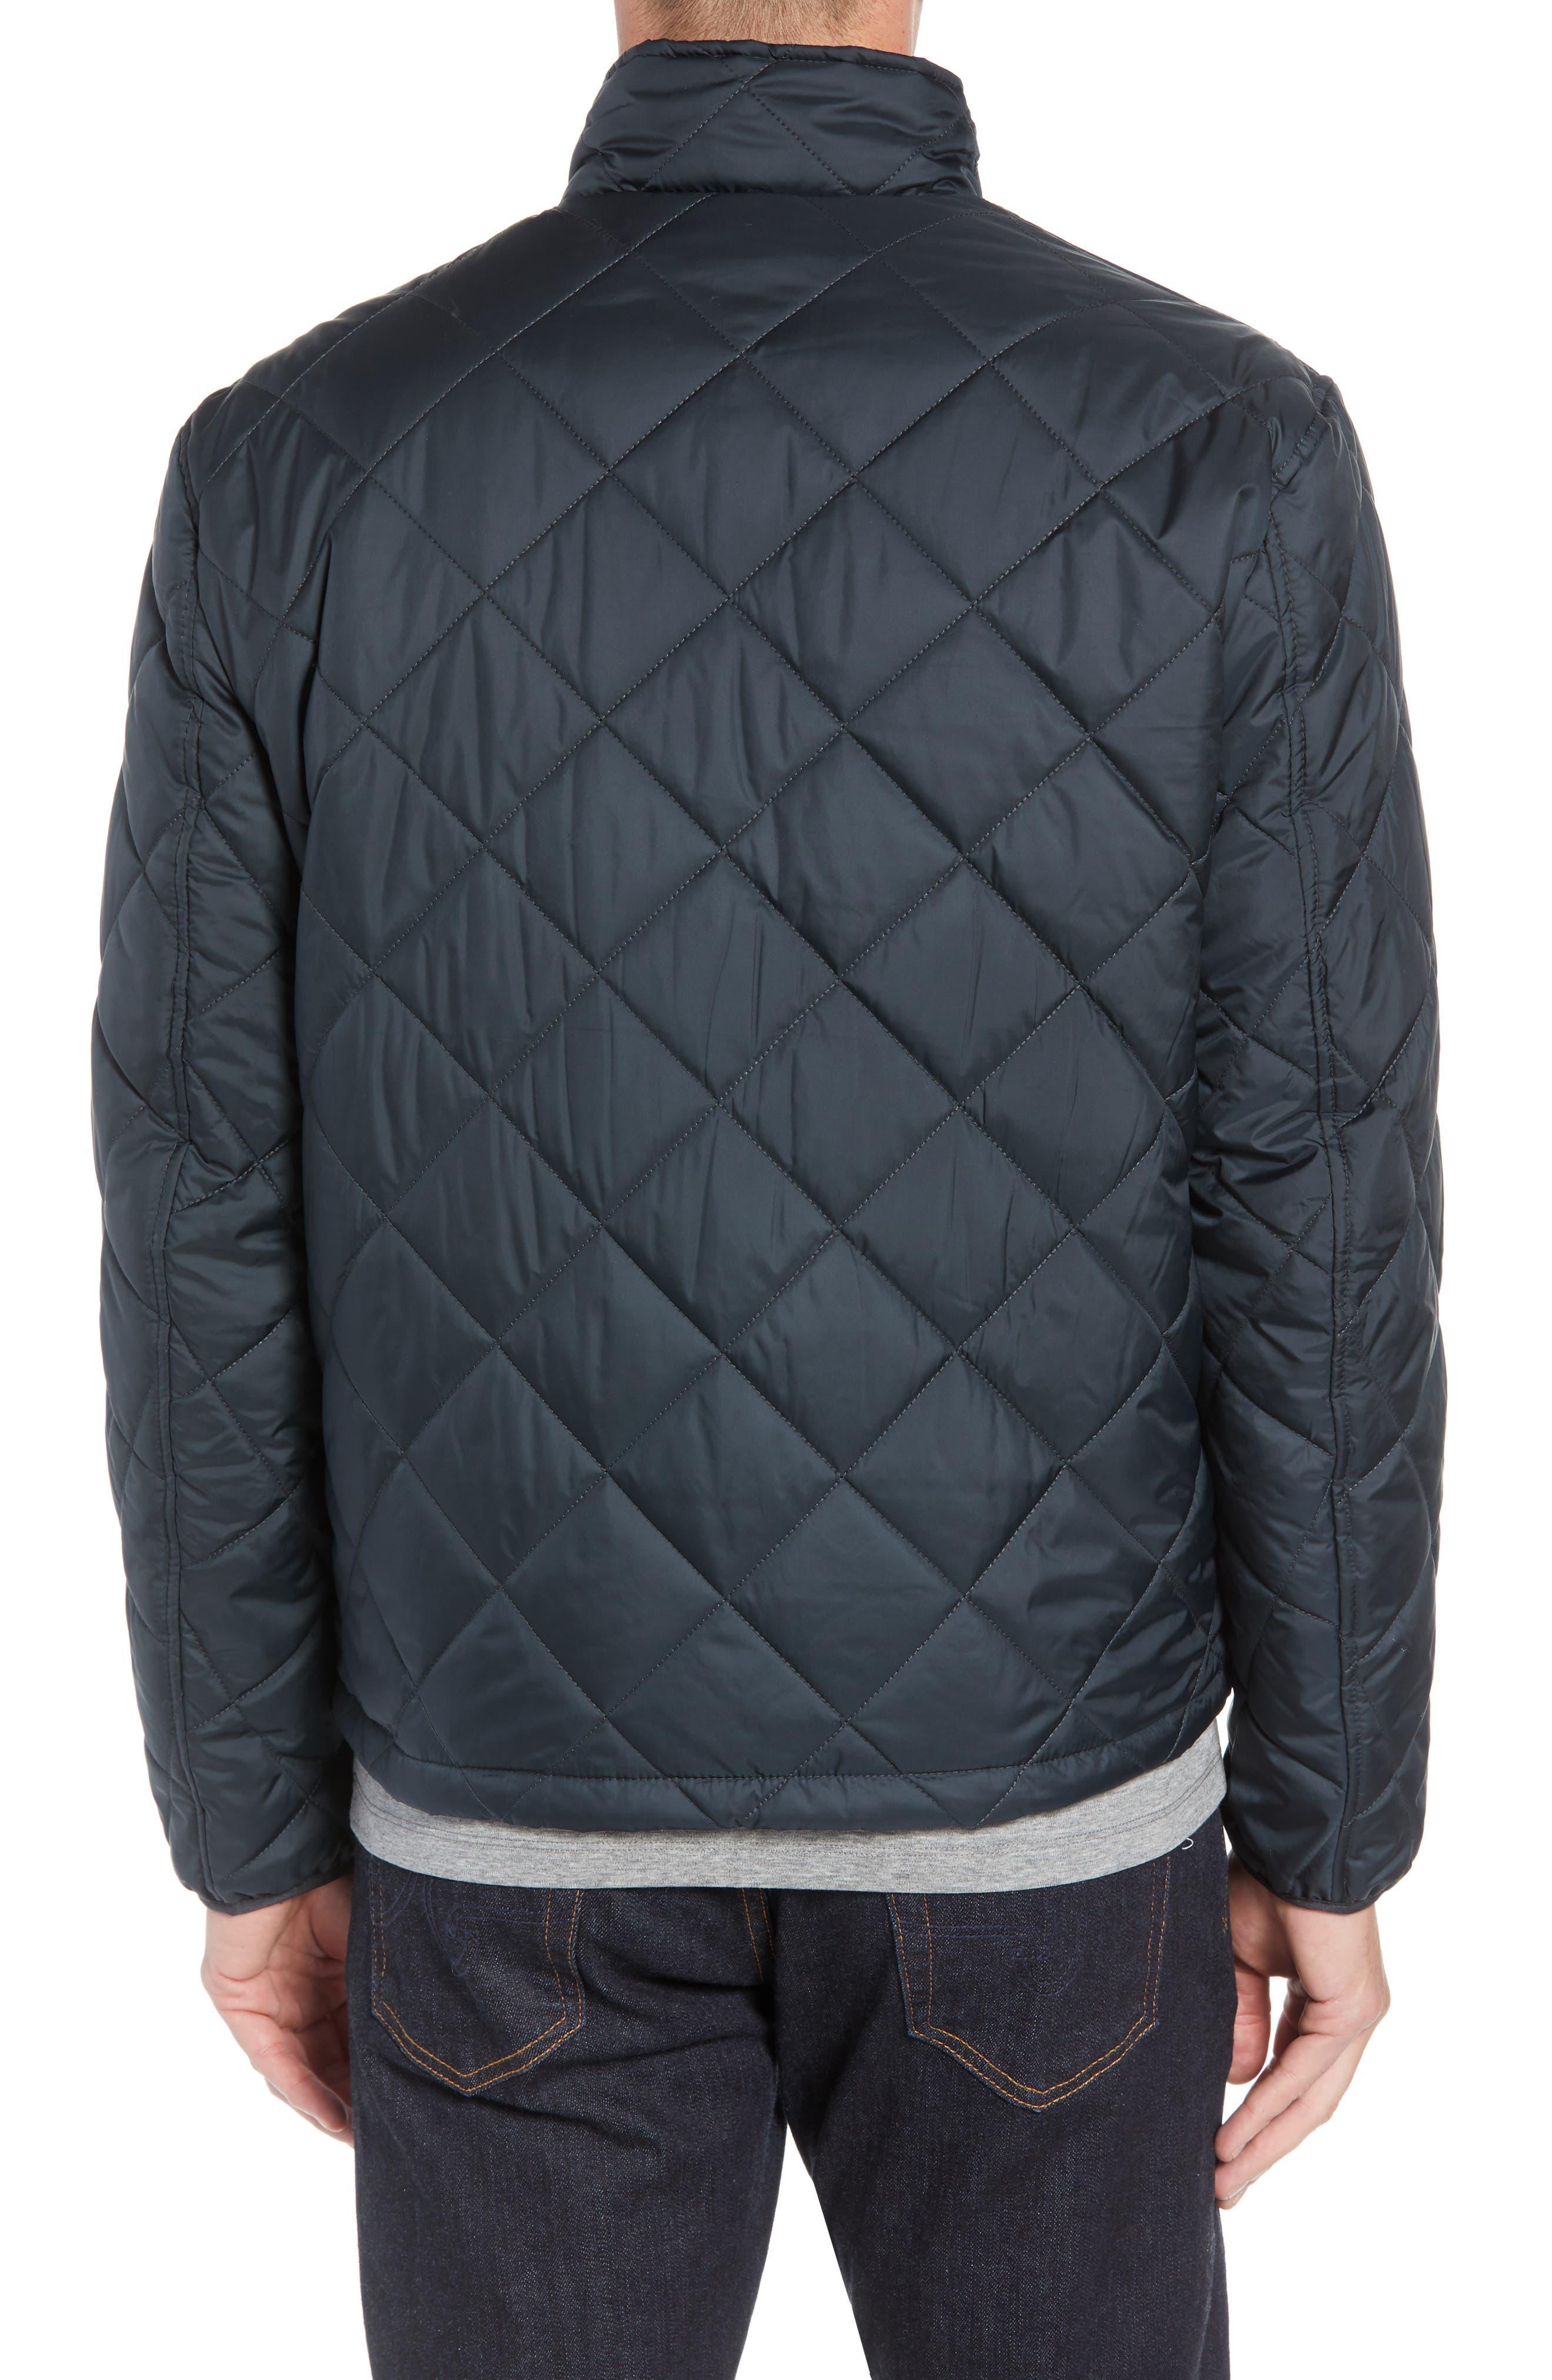 MARC NEW YORK, Humboldt Quilted Jacket, Alternate thumbnail 2, color, BLACK